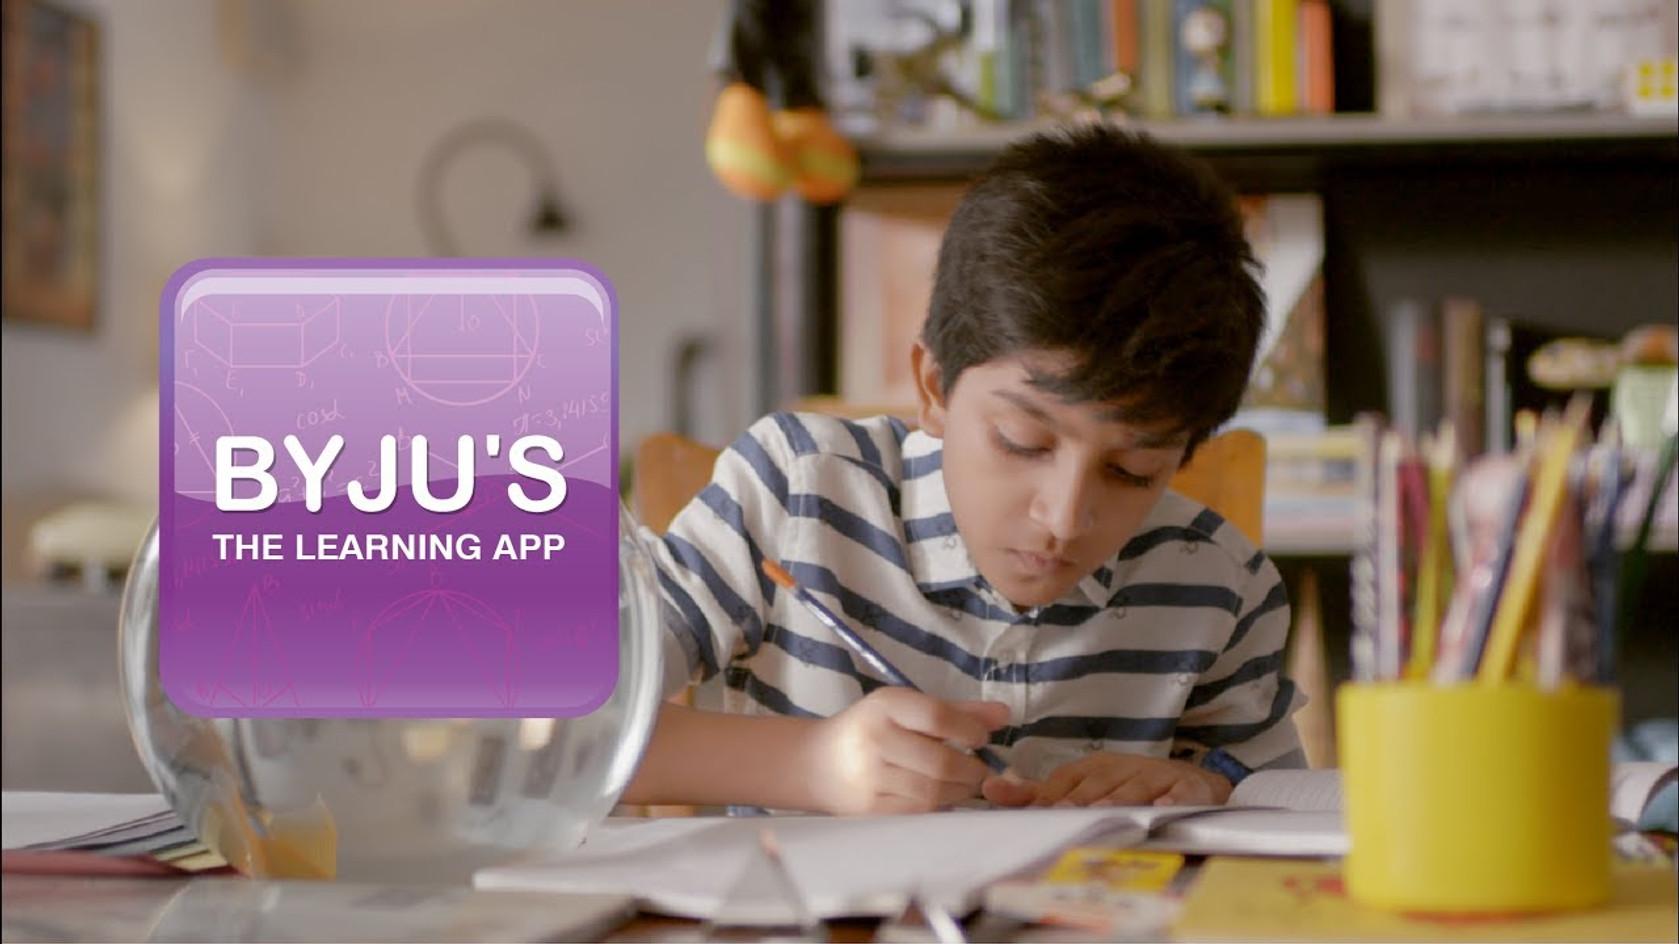 Byju's Learning App | VIBGYOR | Director's Cut